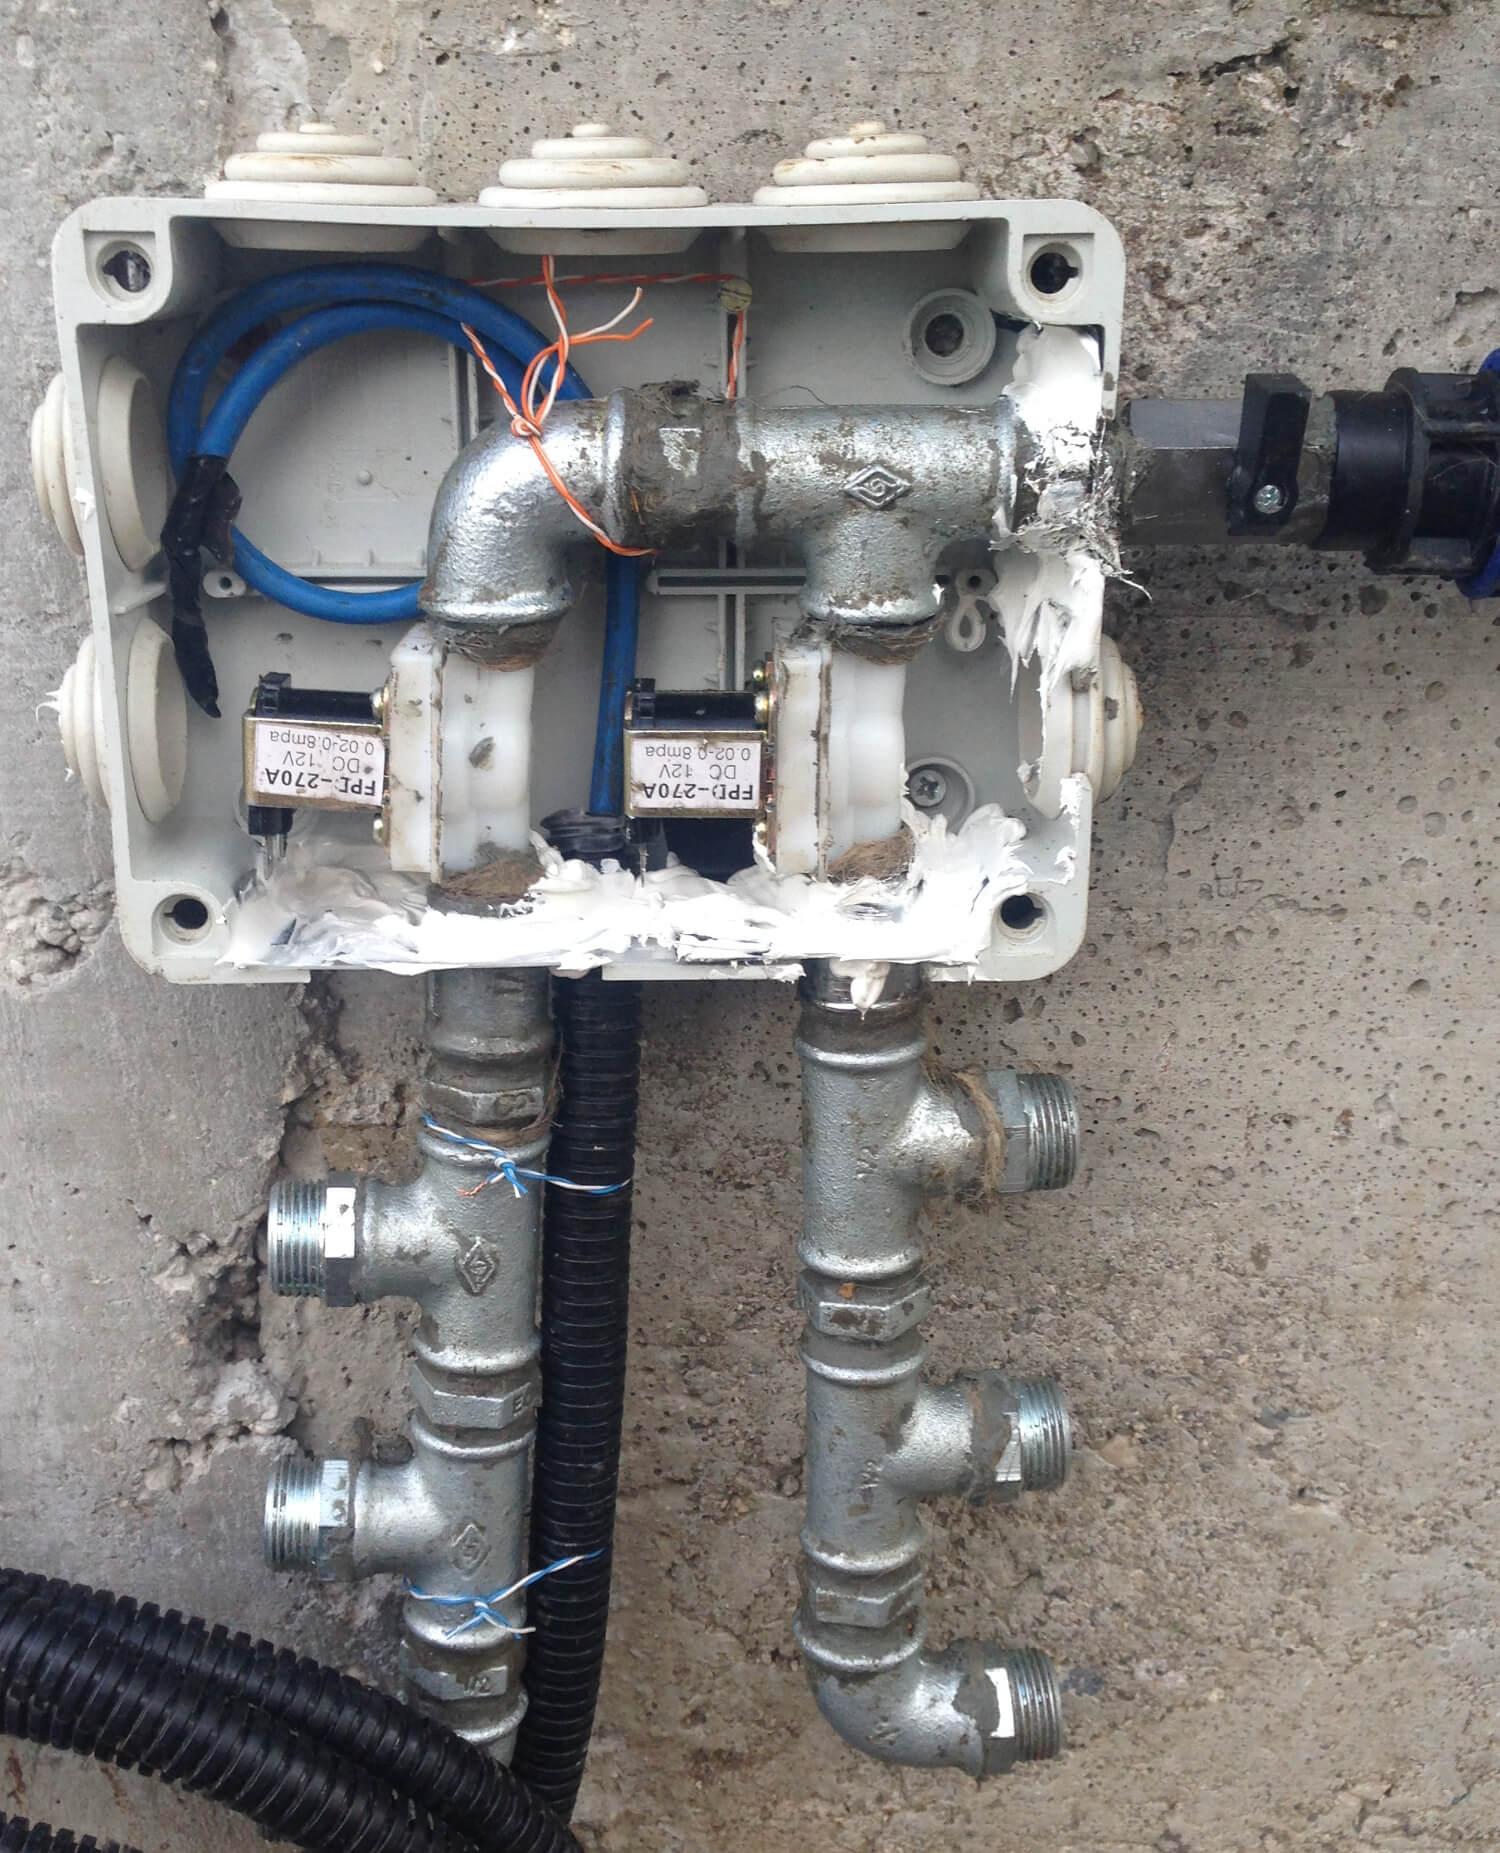 Rpirrigate sistema di irrigazione for Elettrovalvole per irrigazione